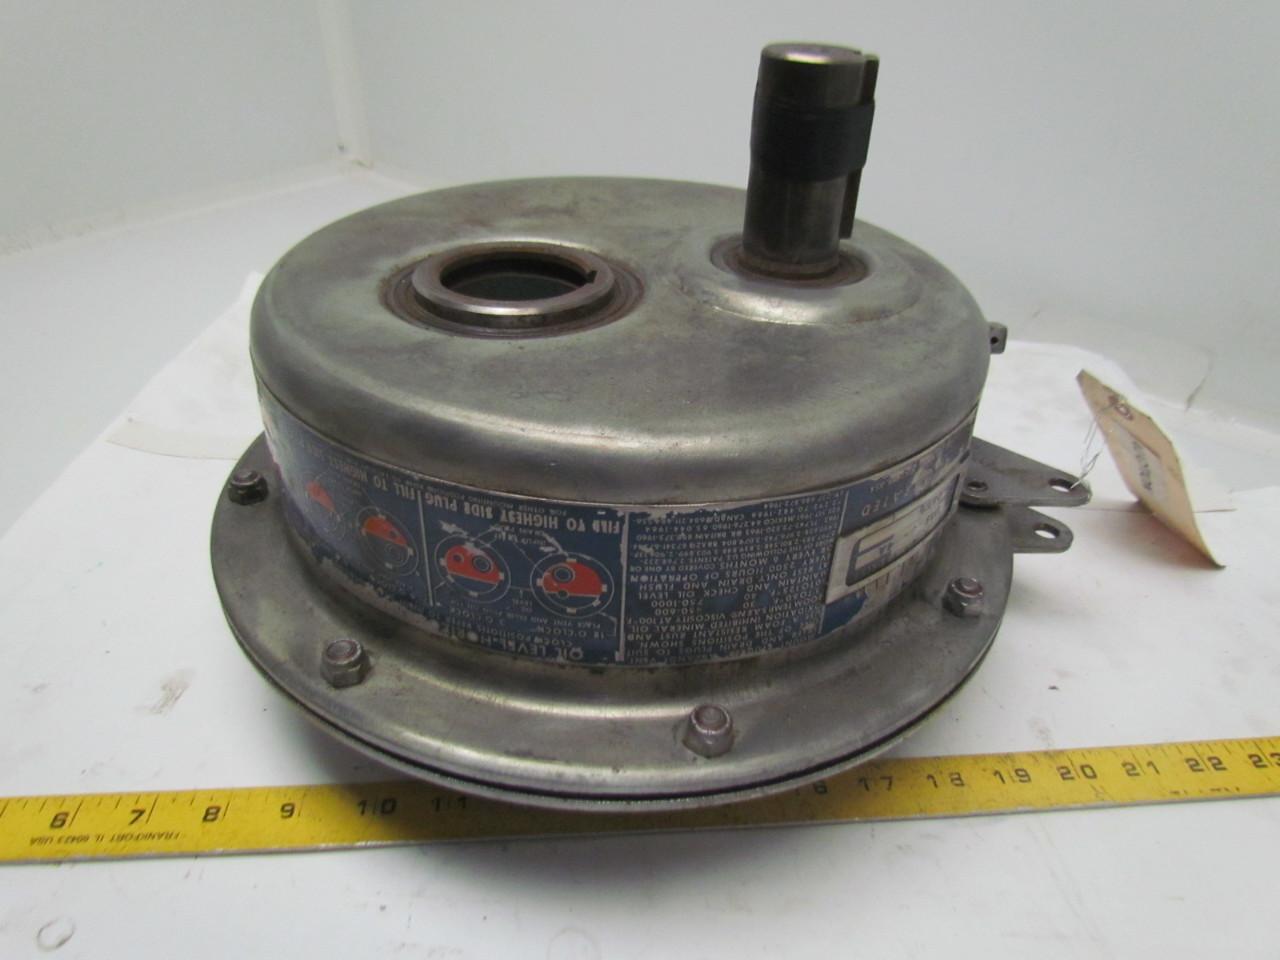 Falk j a shaft mounted gear drive reducer